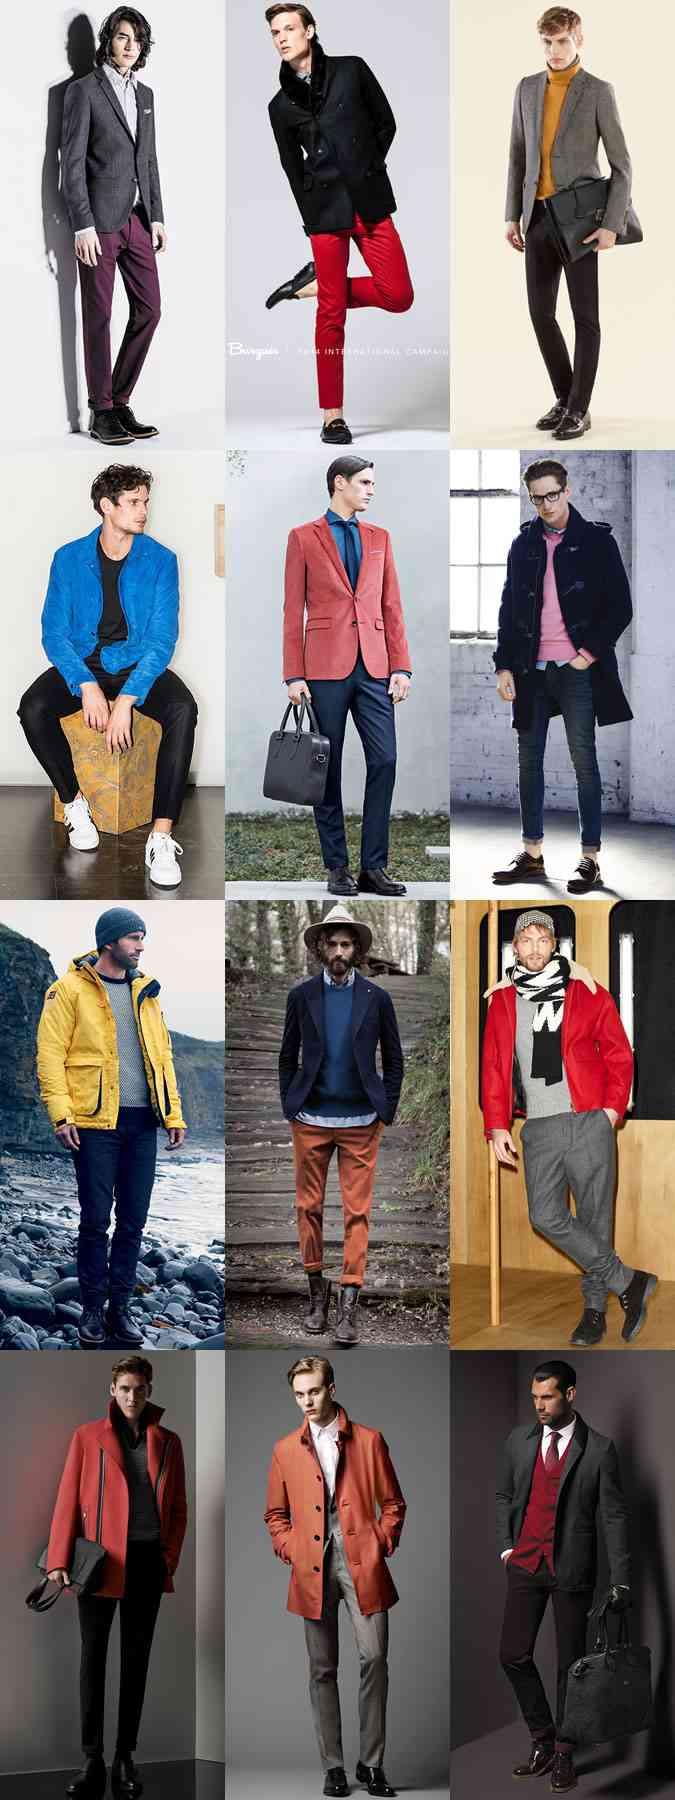 culori la moda iarna 2014 2015